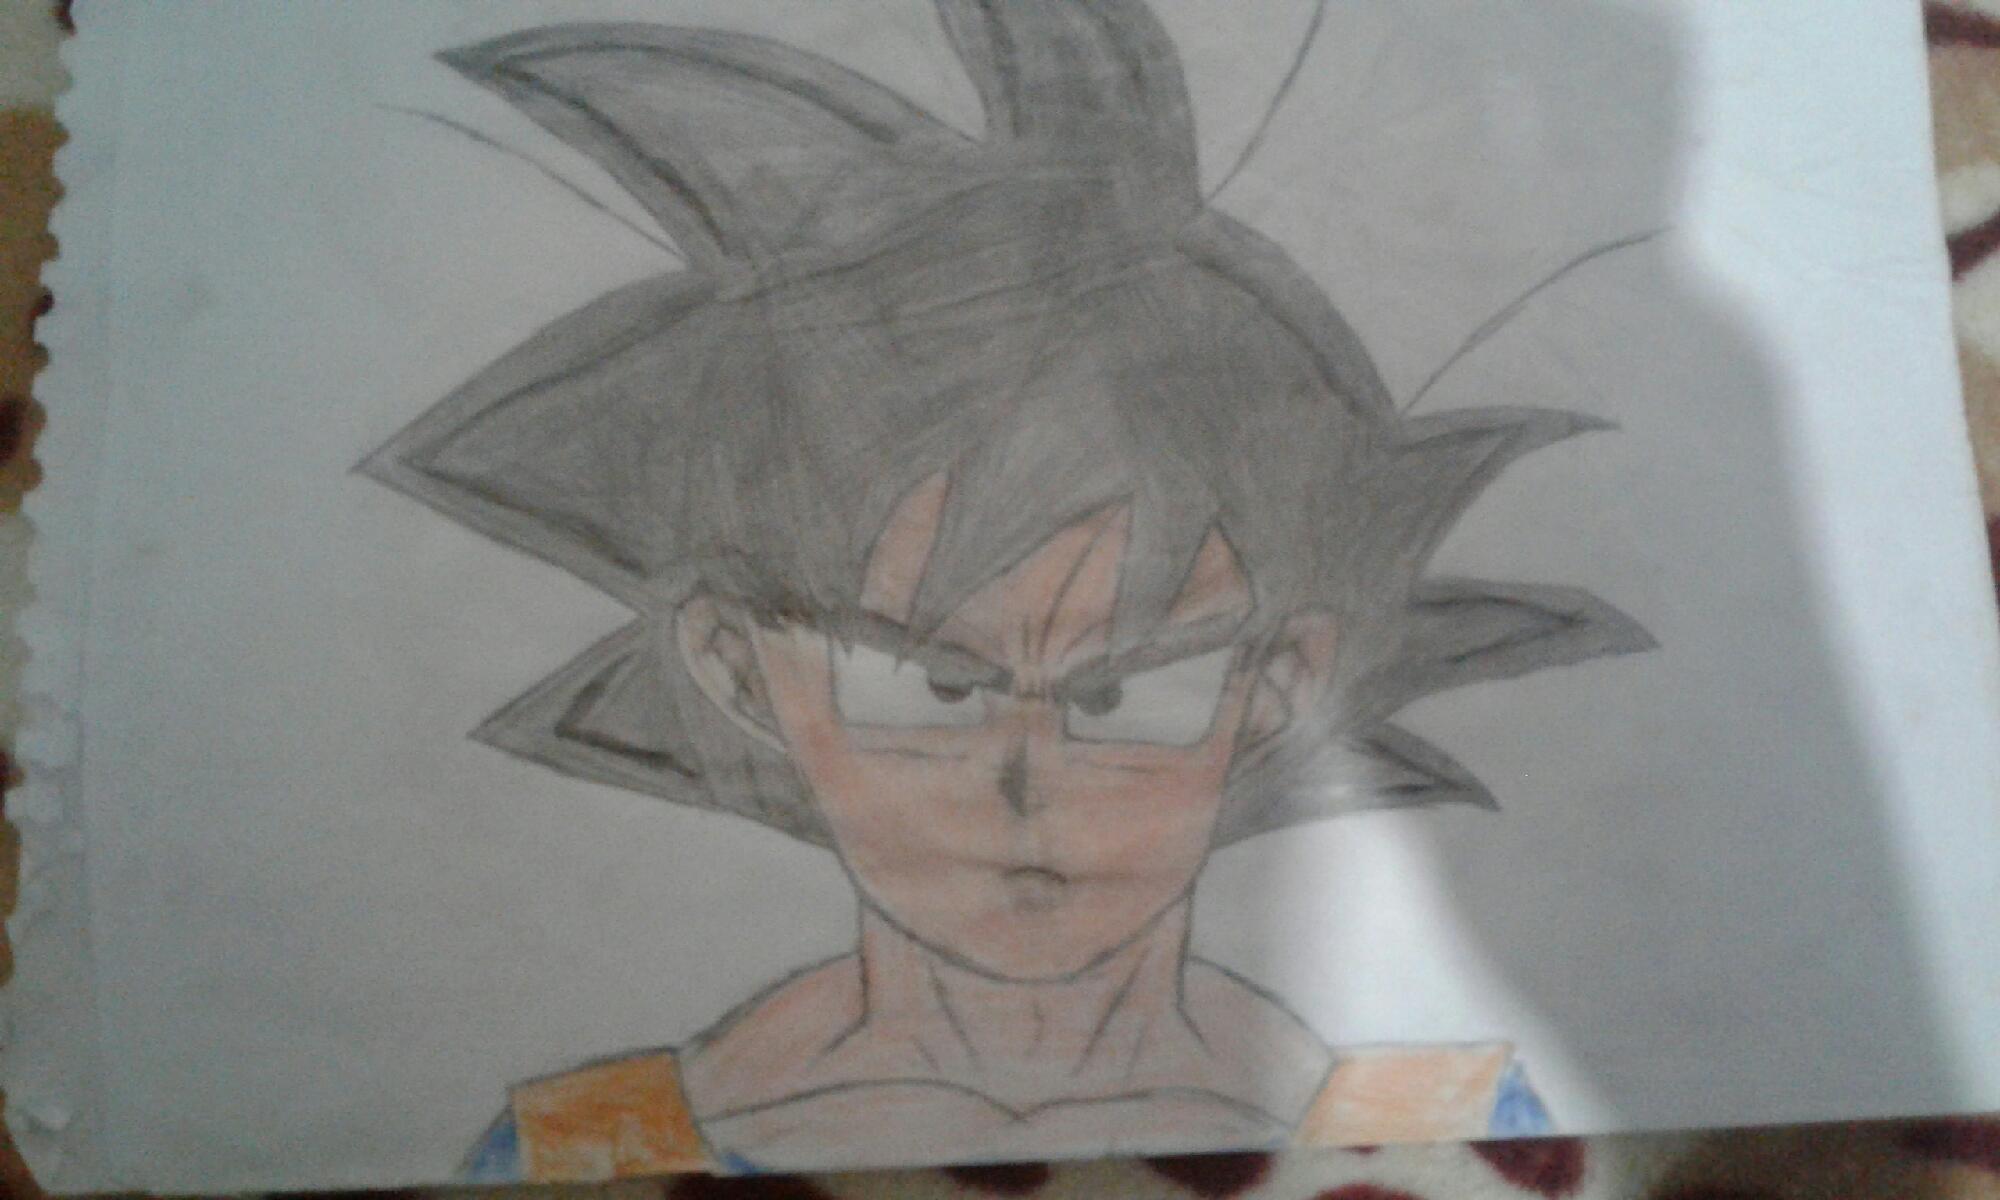 Meu desenho lixo